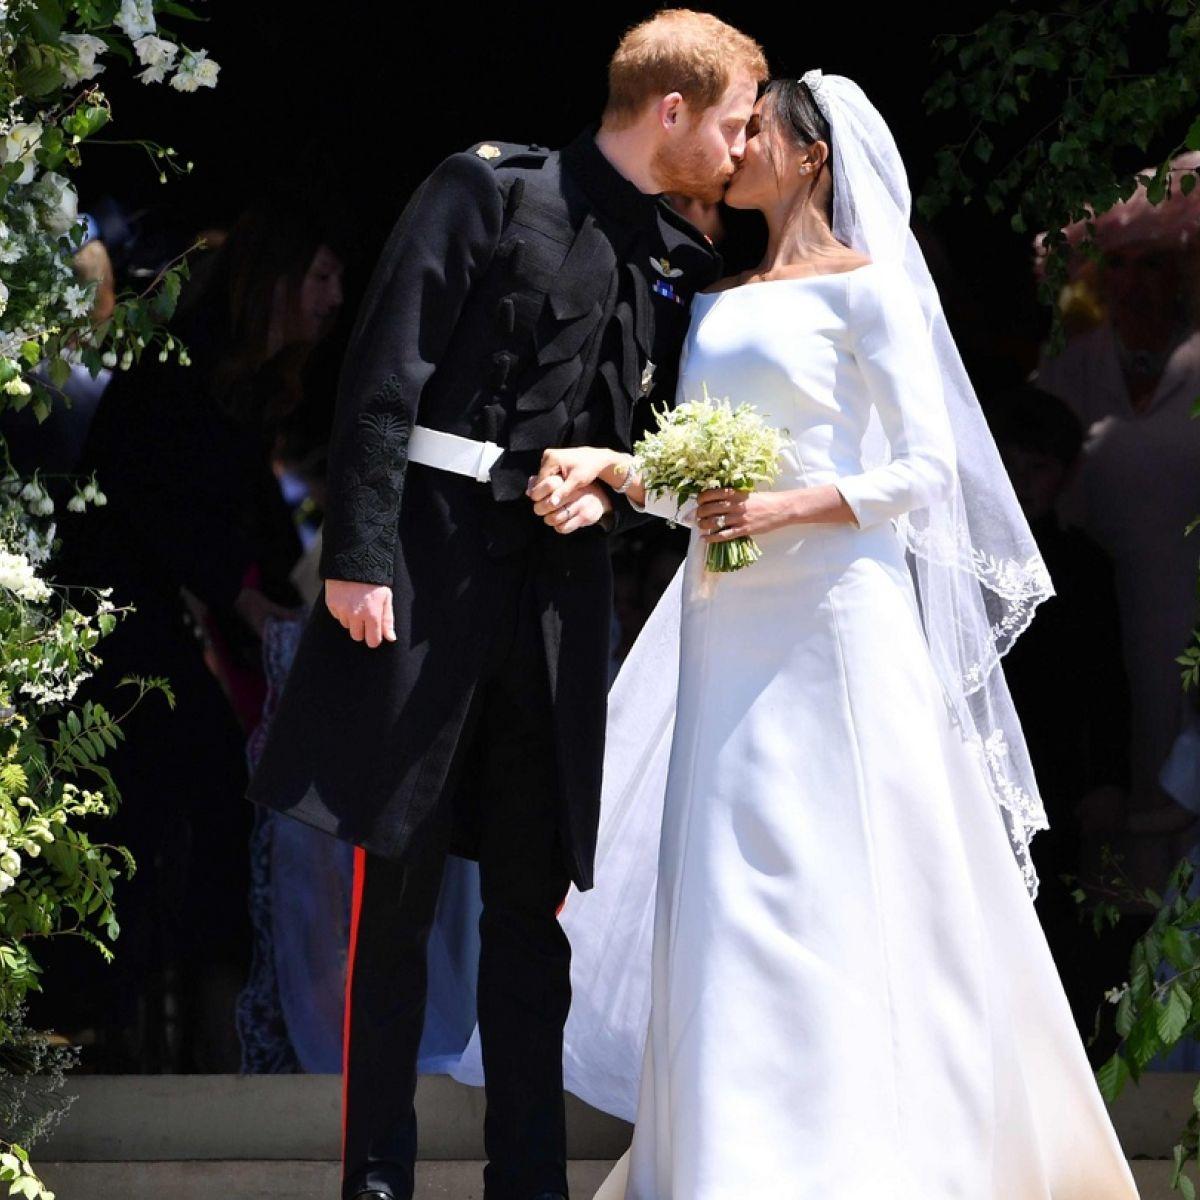 Meghan Markle exudes sleek style in choice of wedding dress